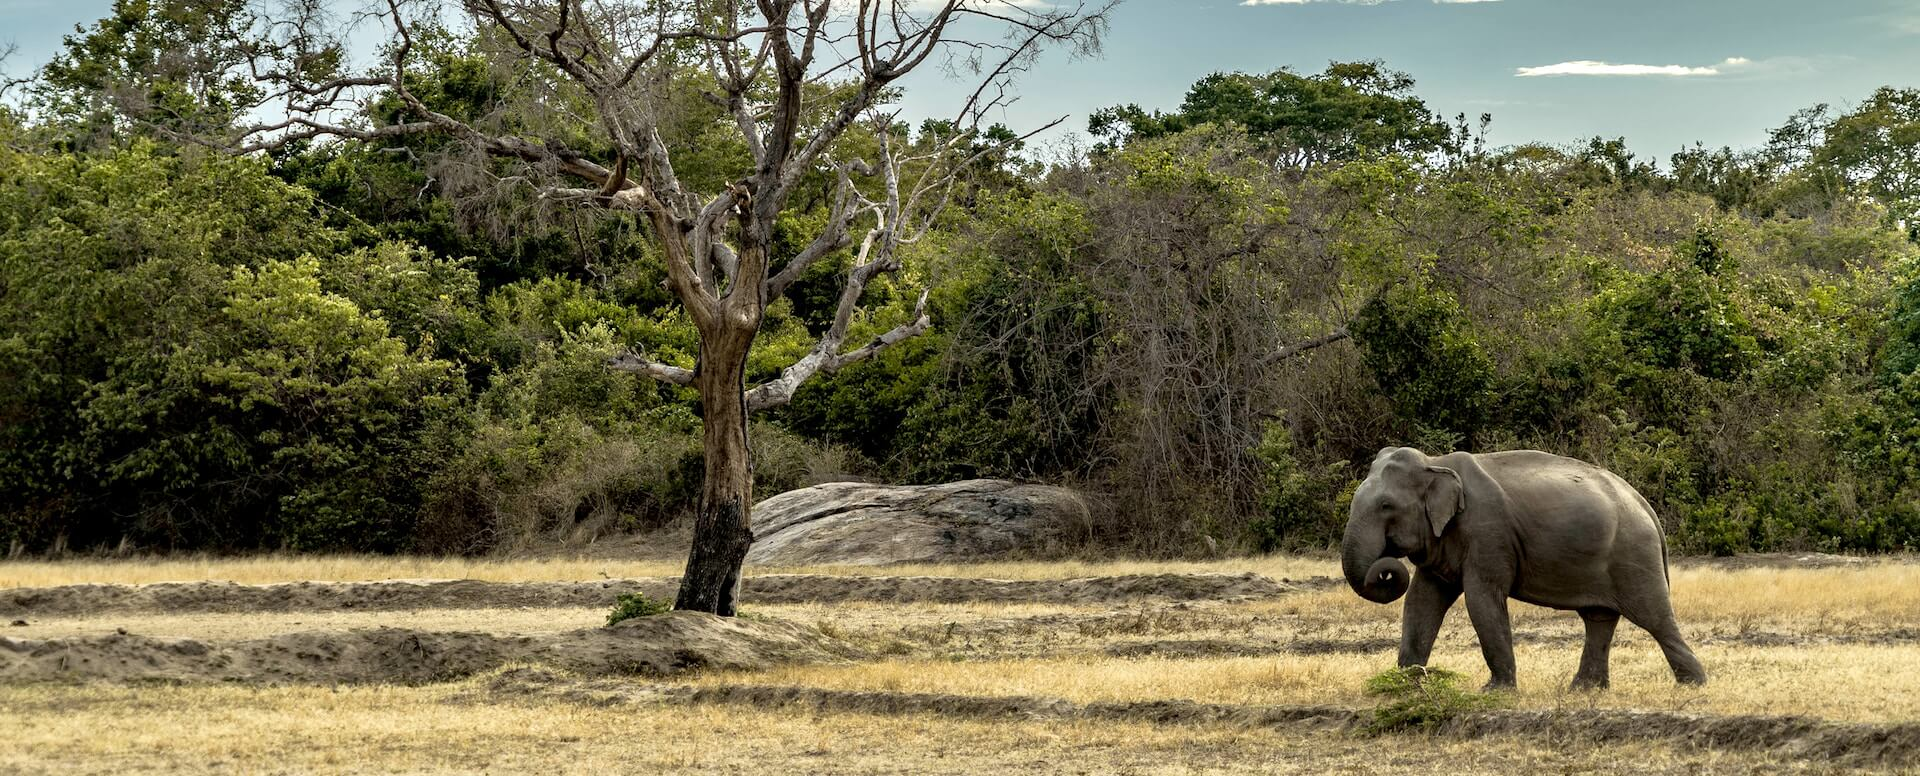 Parc national de Yala - Sri Lanka